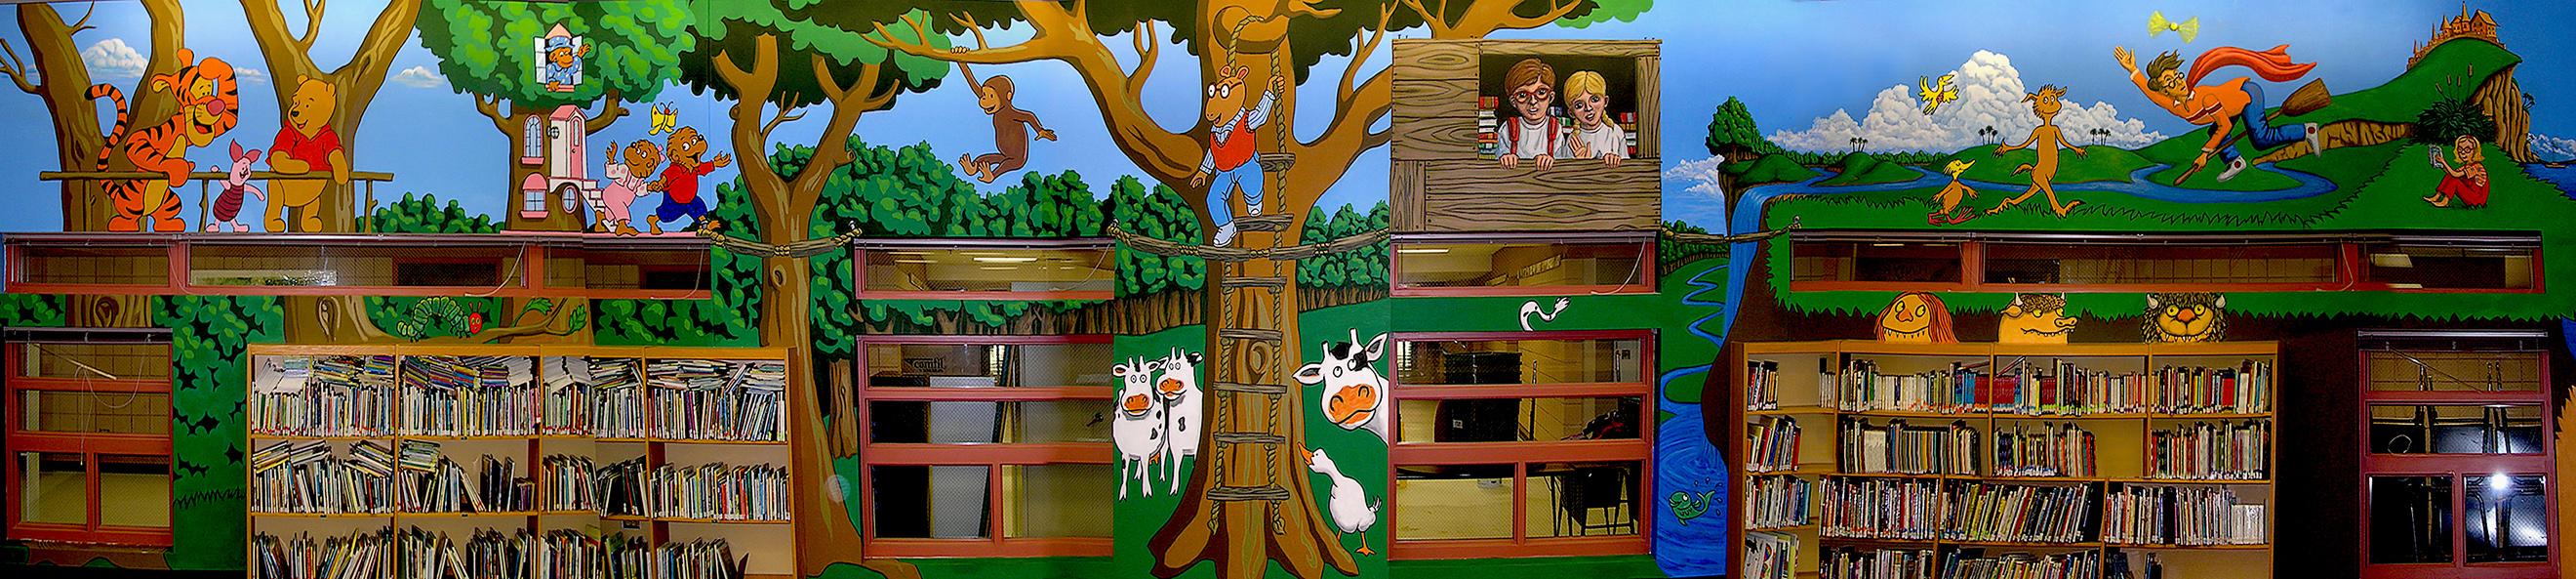 Murals the art of jason stillman for Elementary school mural